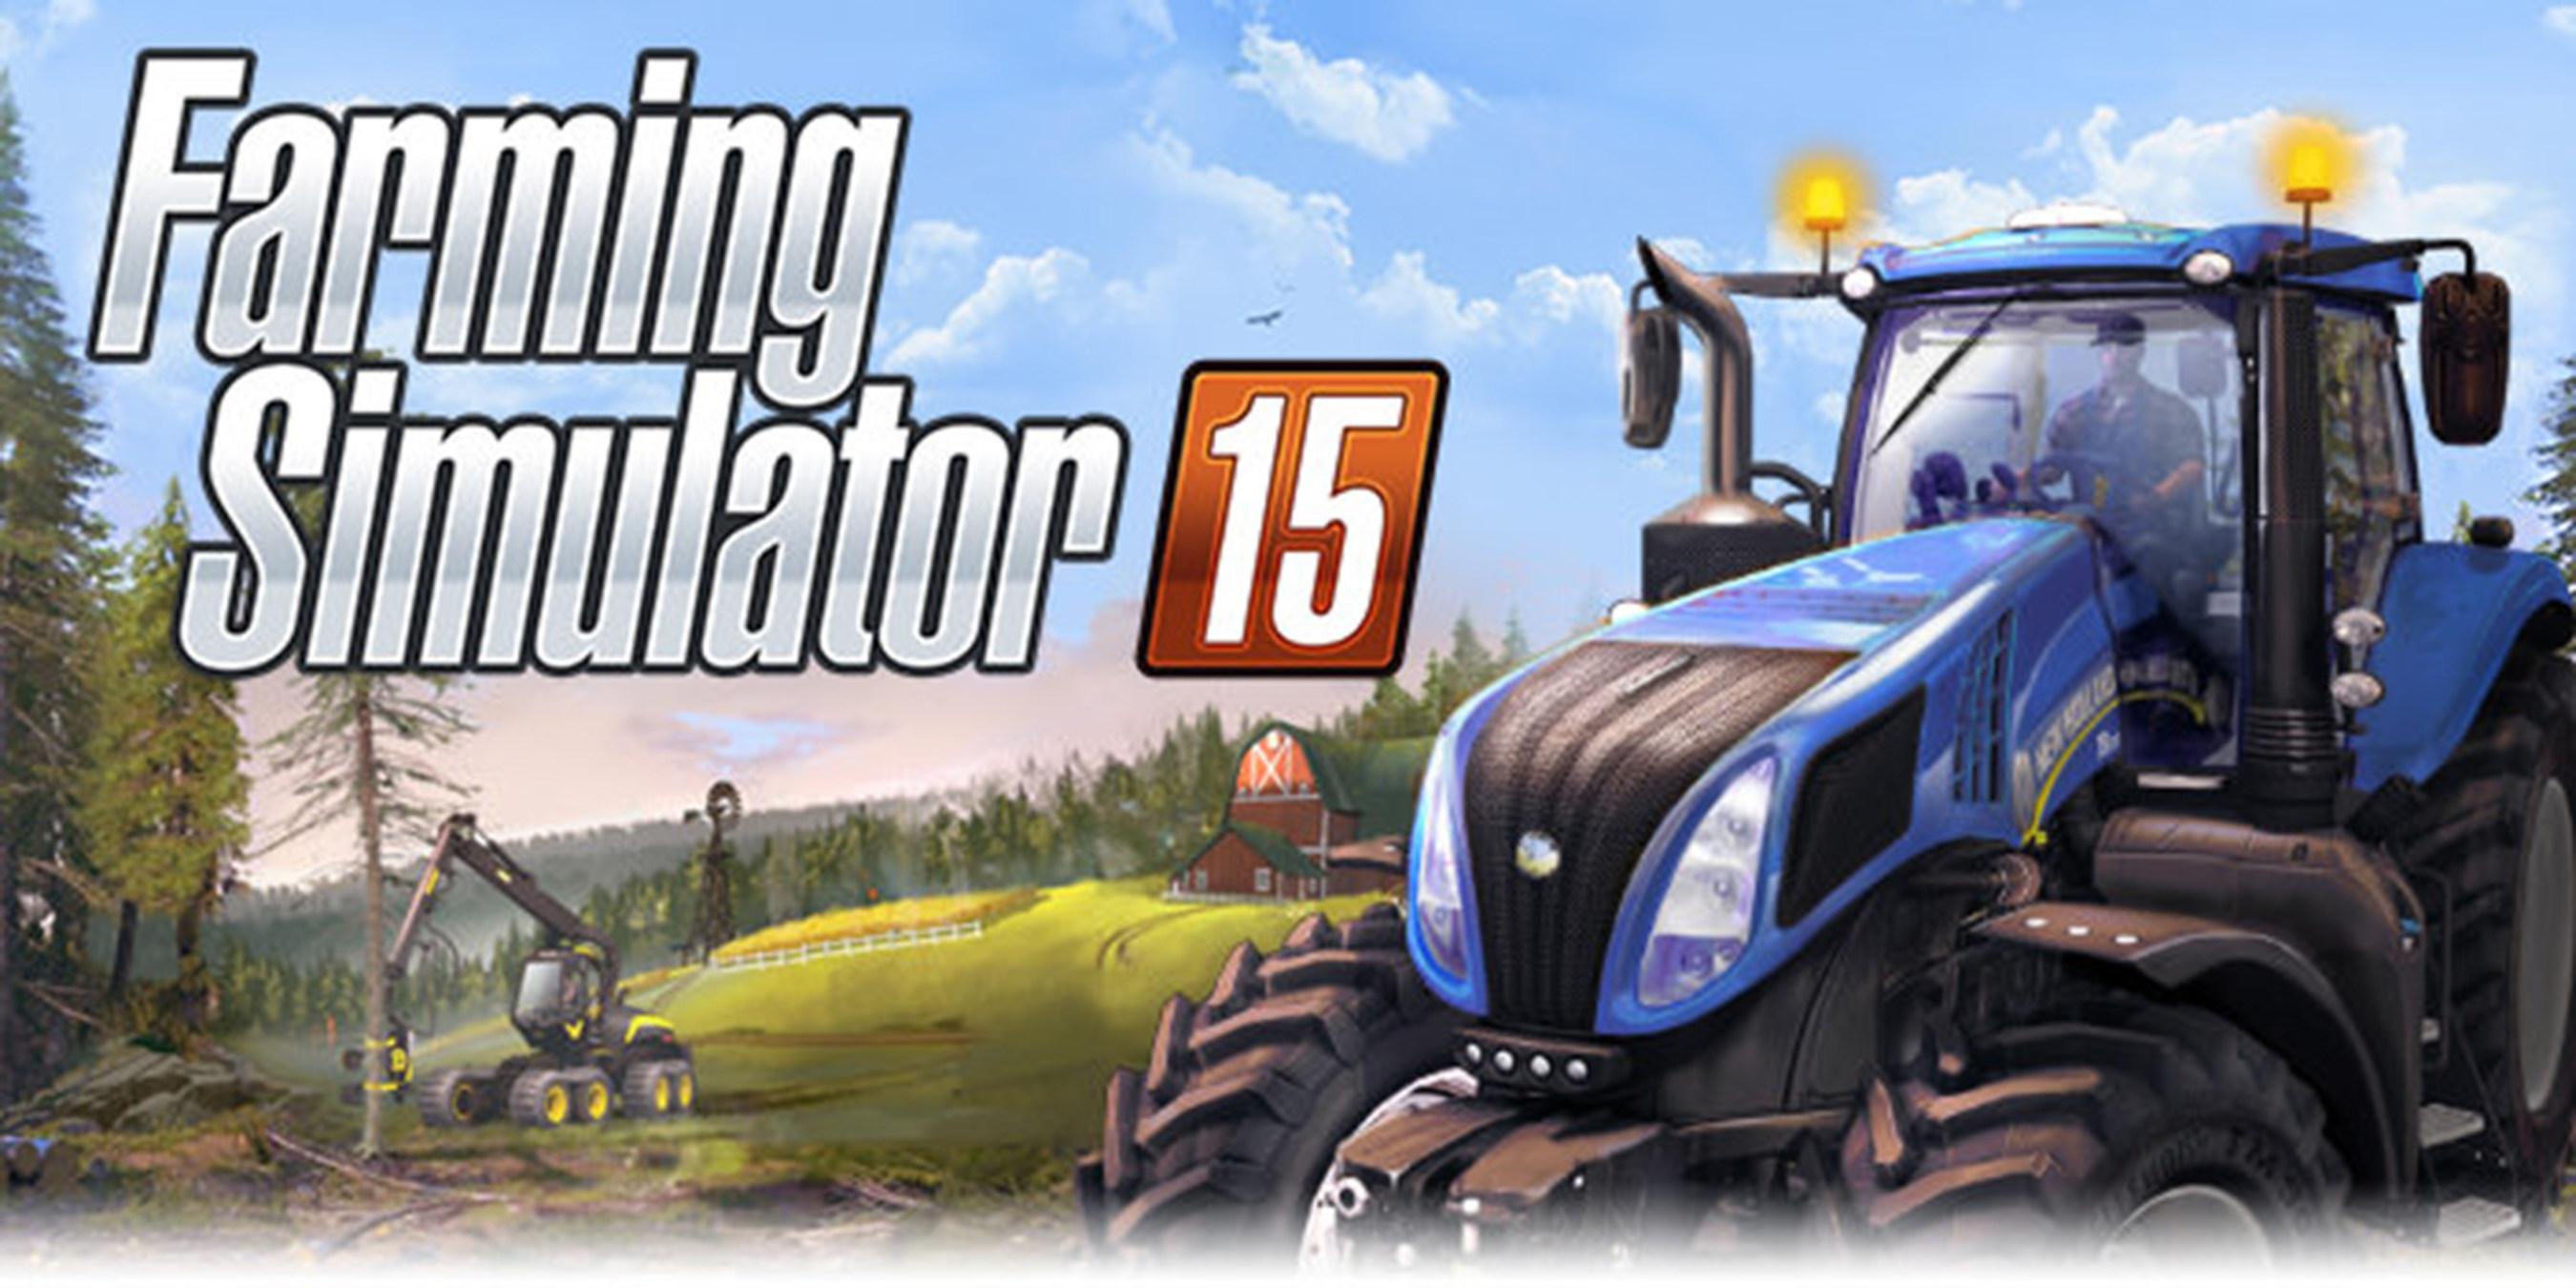 Farming Simulator 15 on Consoles: The Multiplayer Trailer